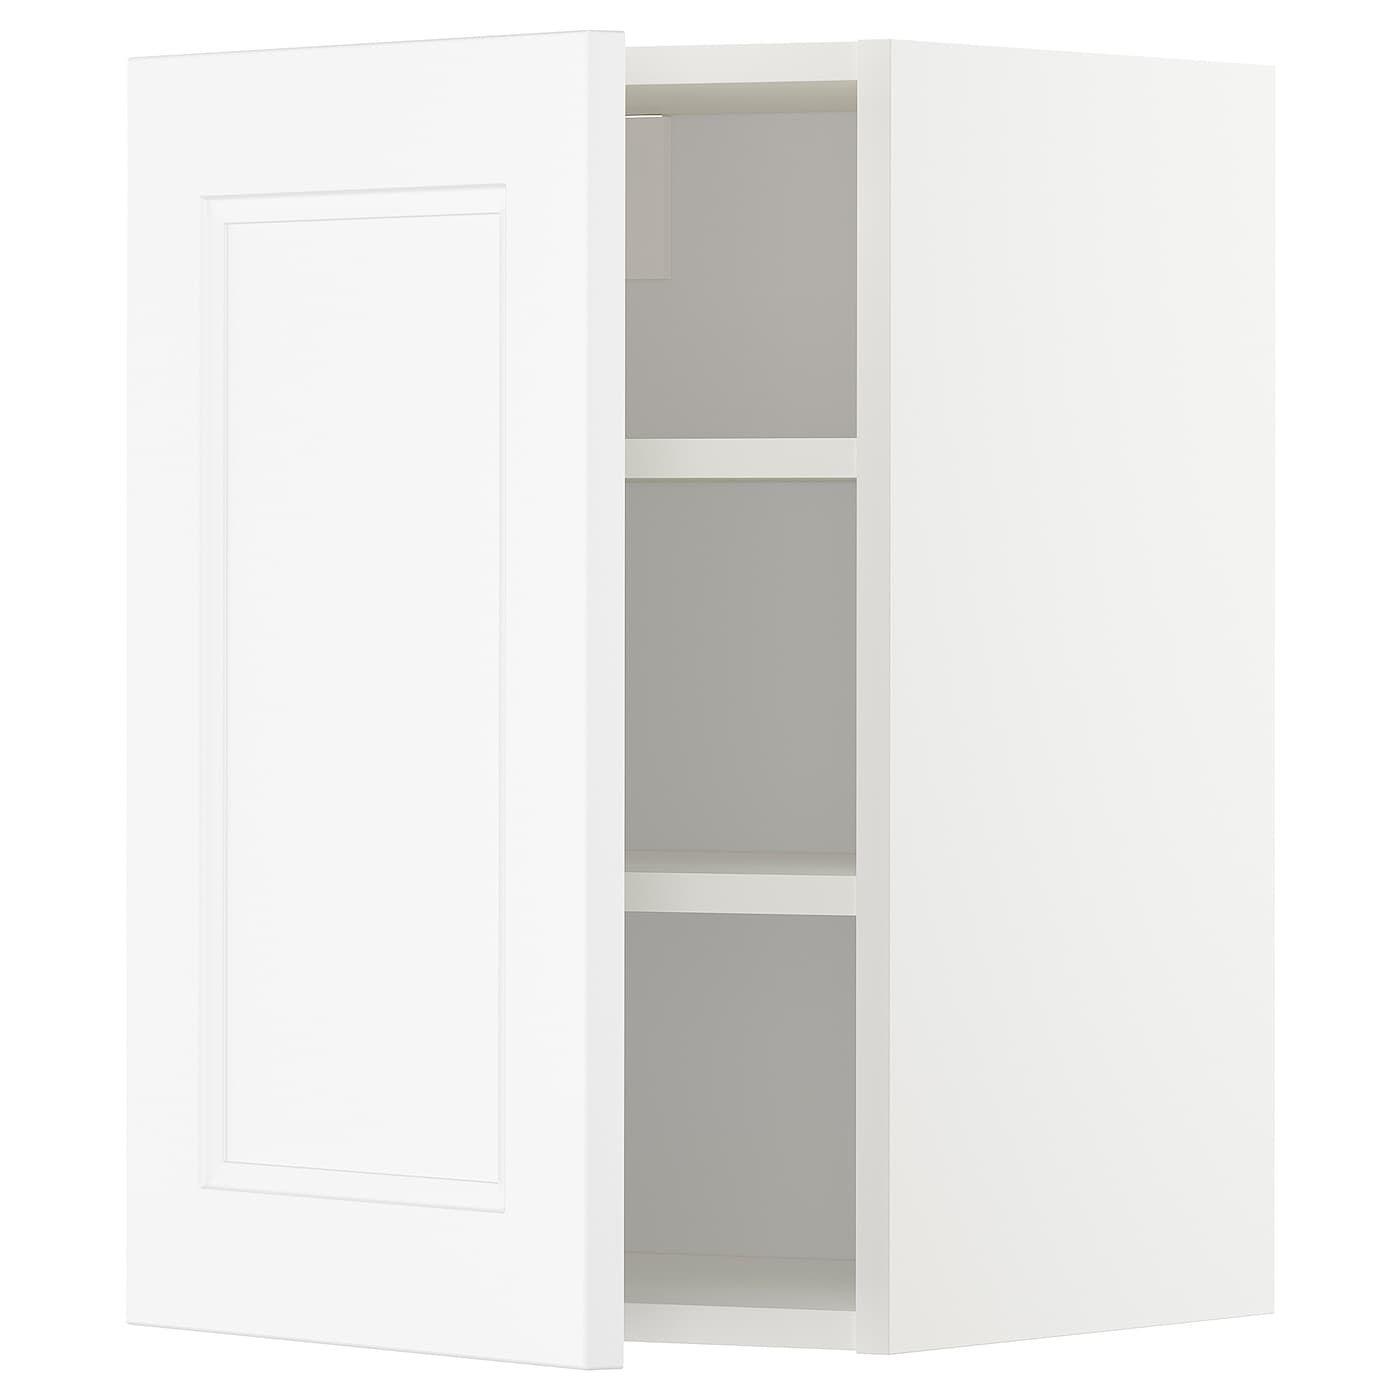 Metod Wall Cabinet With Shelves White Axstad Matt White 40x60